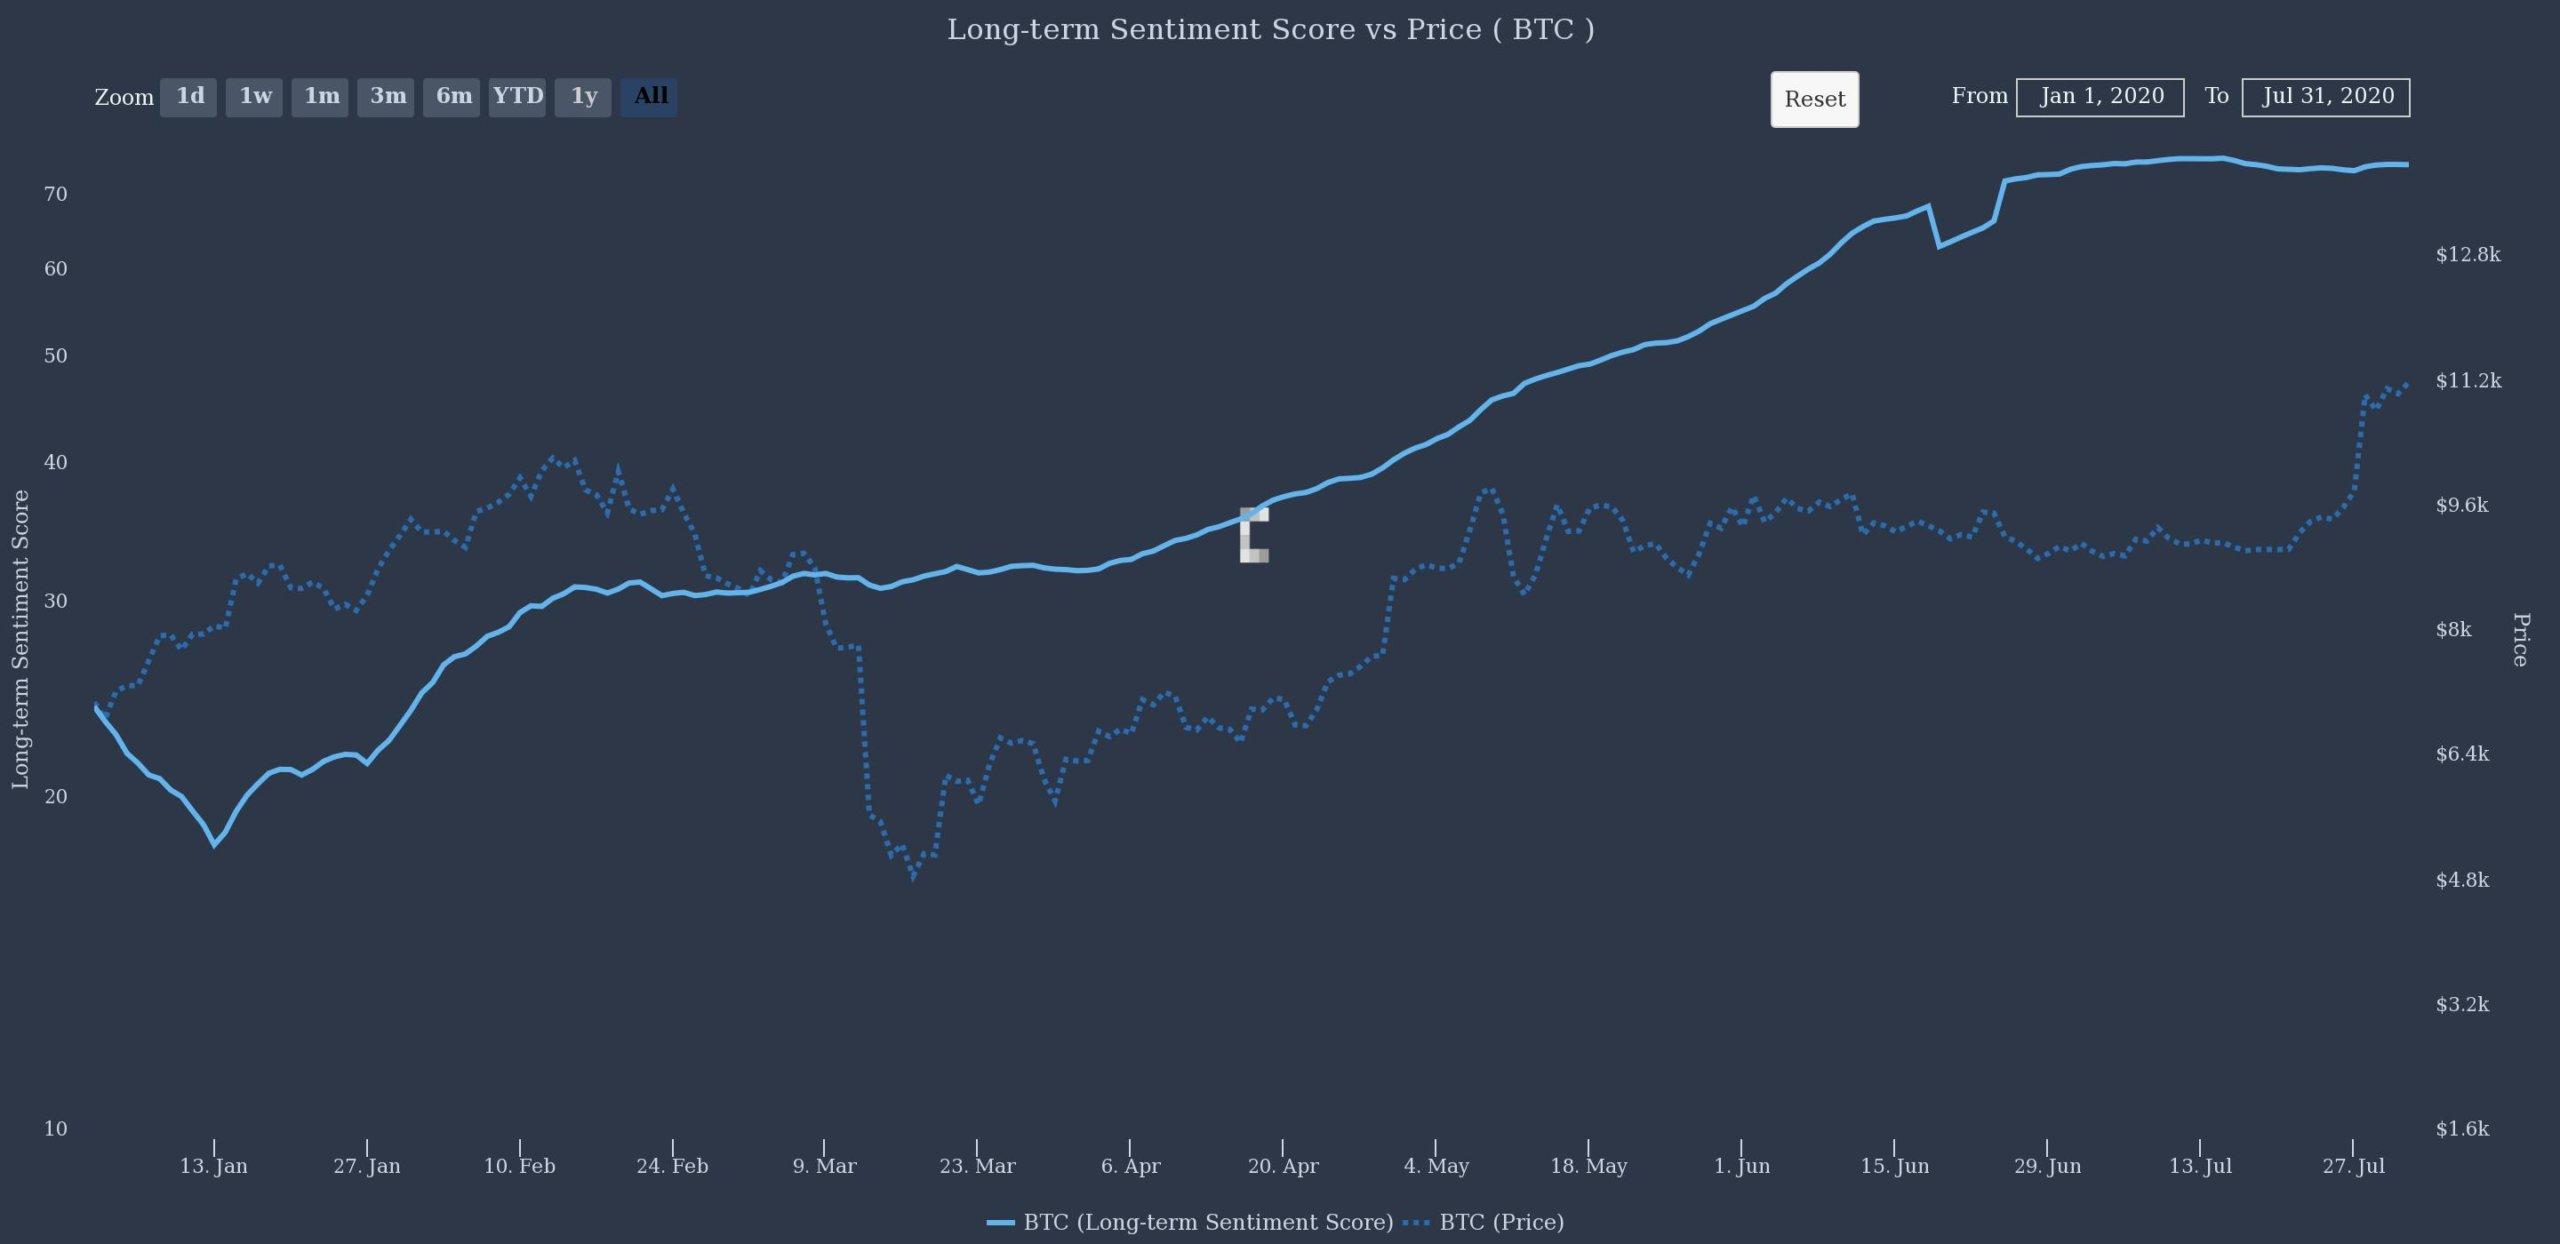 Bitcoin Long Term Sentiment Score vs. Price